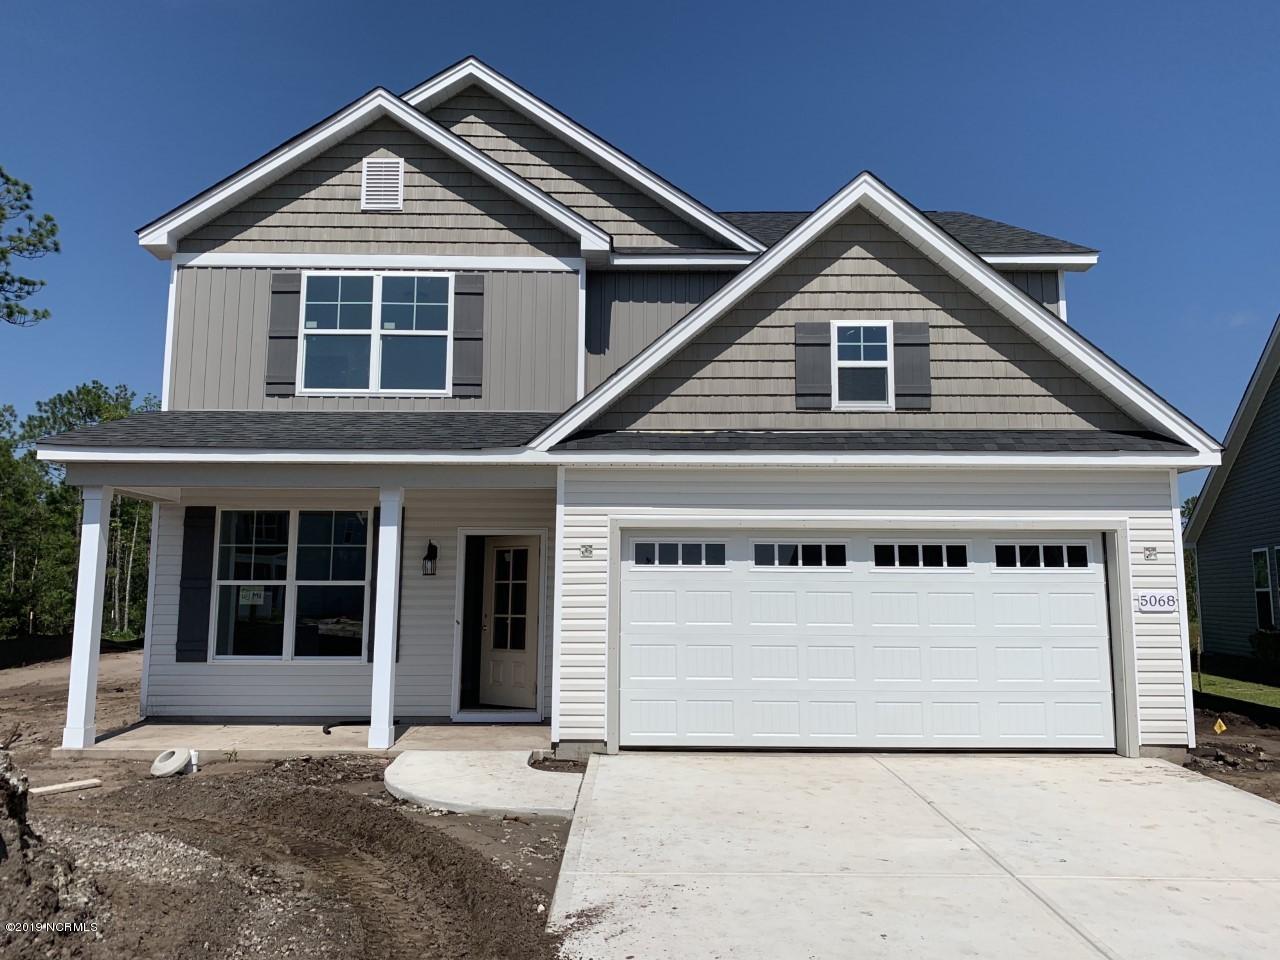 5068 W Chandler Heights Drive Leland, NC 28451